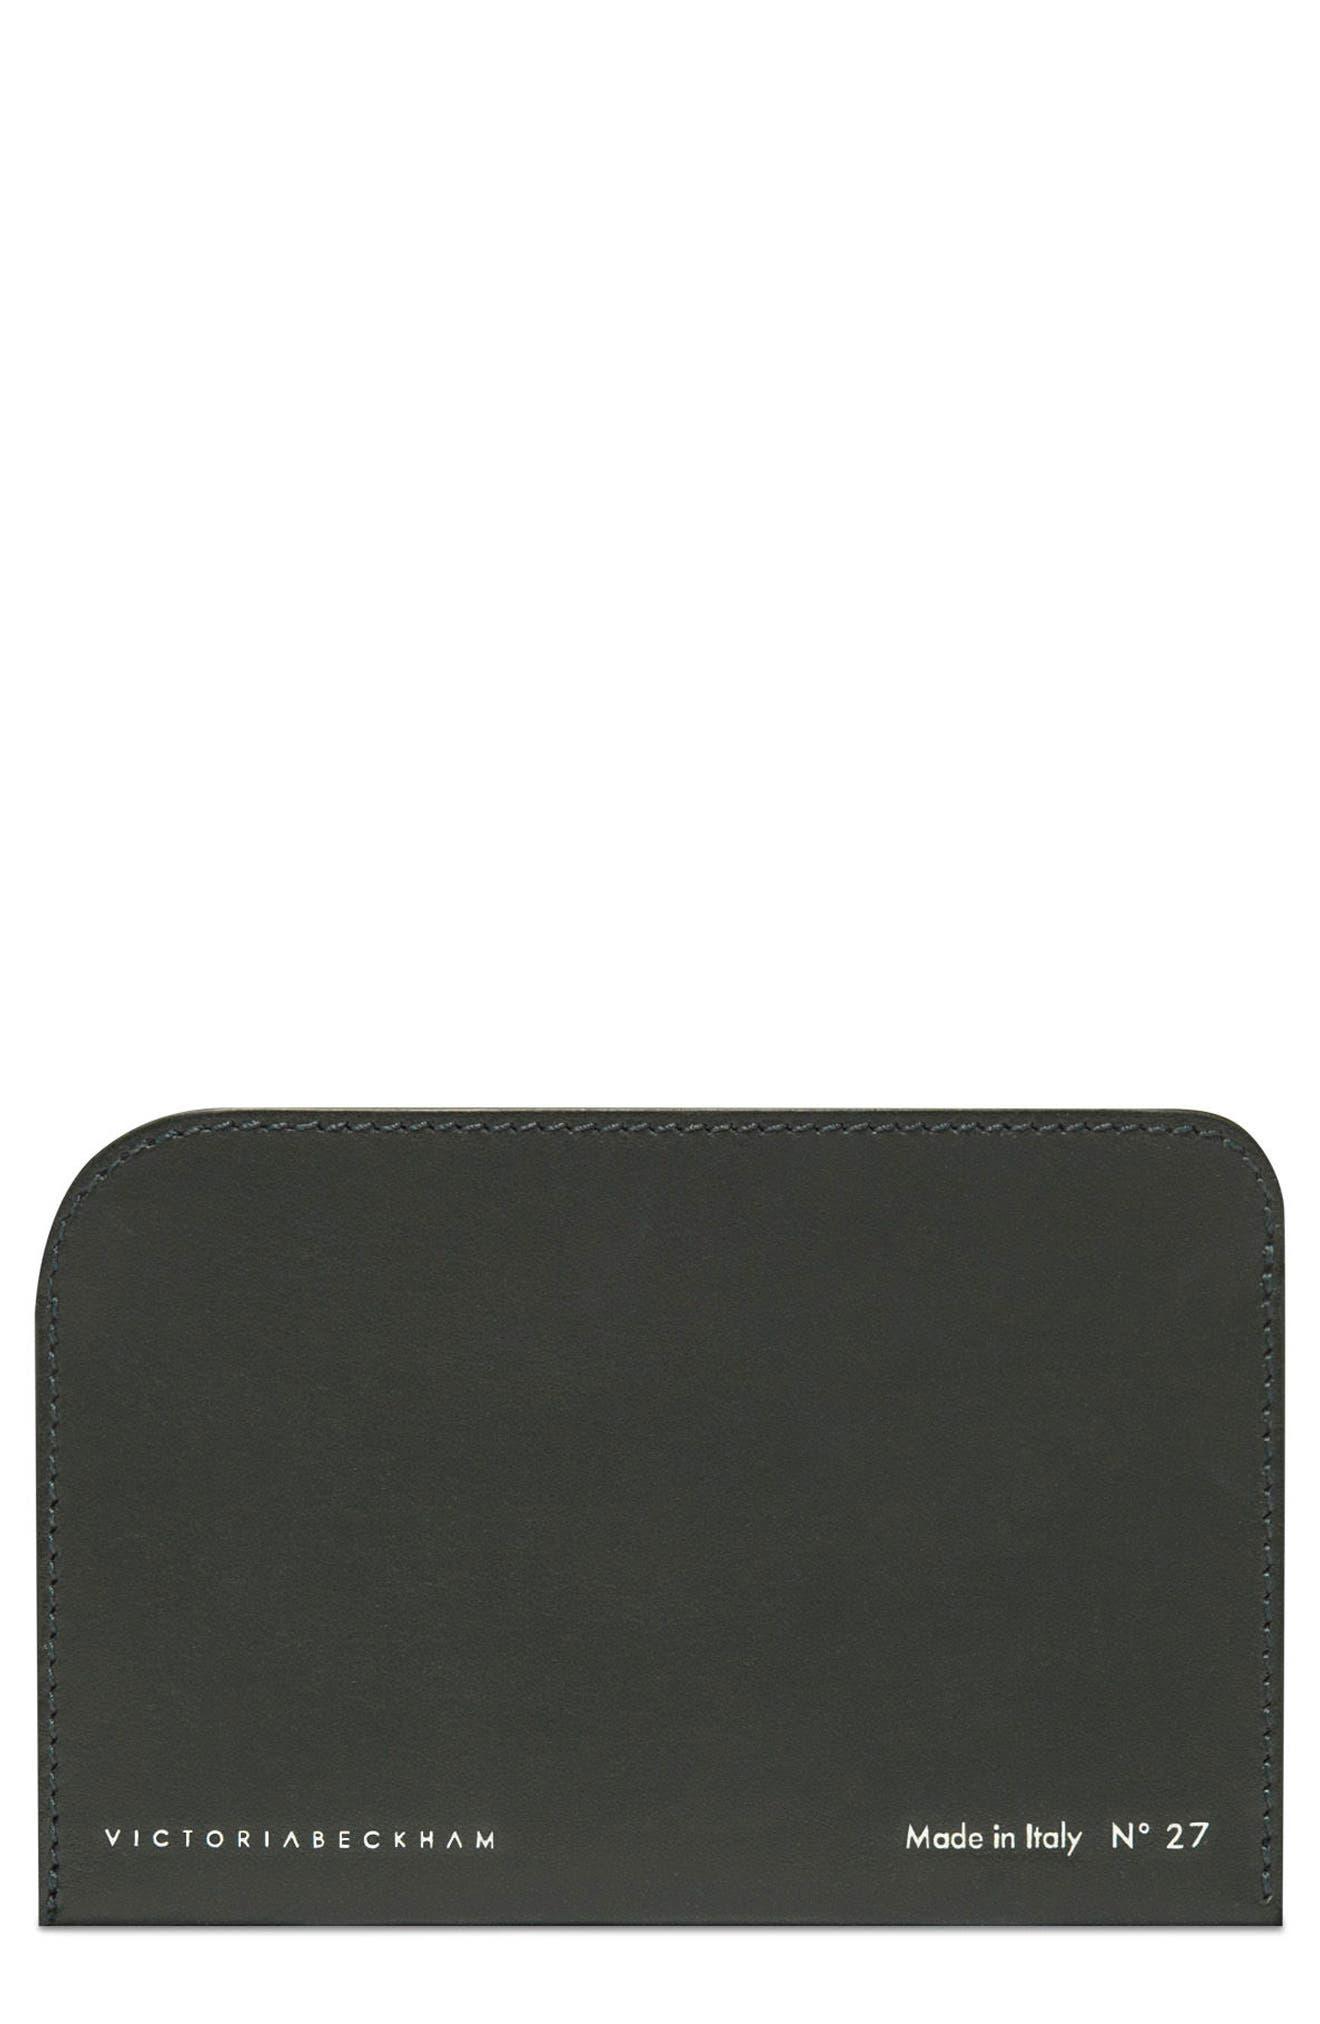 Main Image - Victoria Beckham Leather Card Case